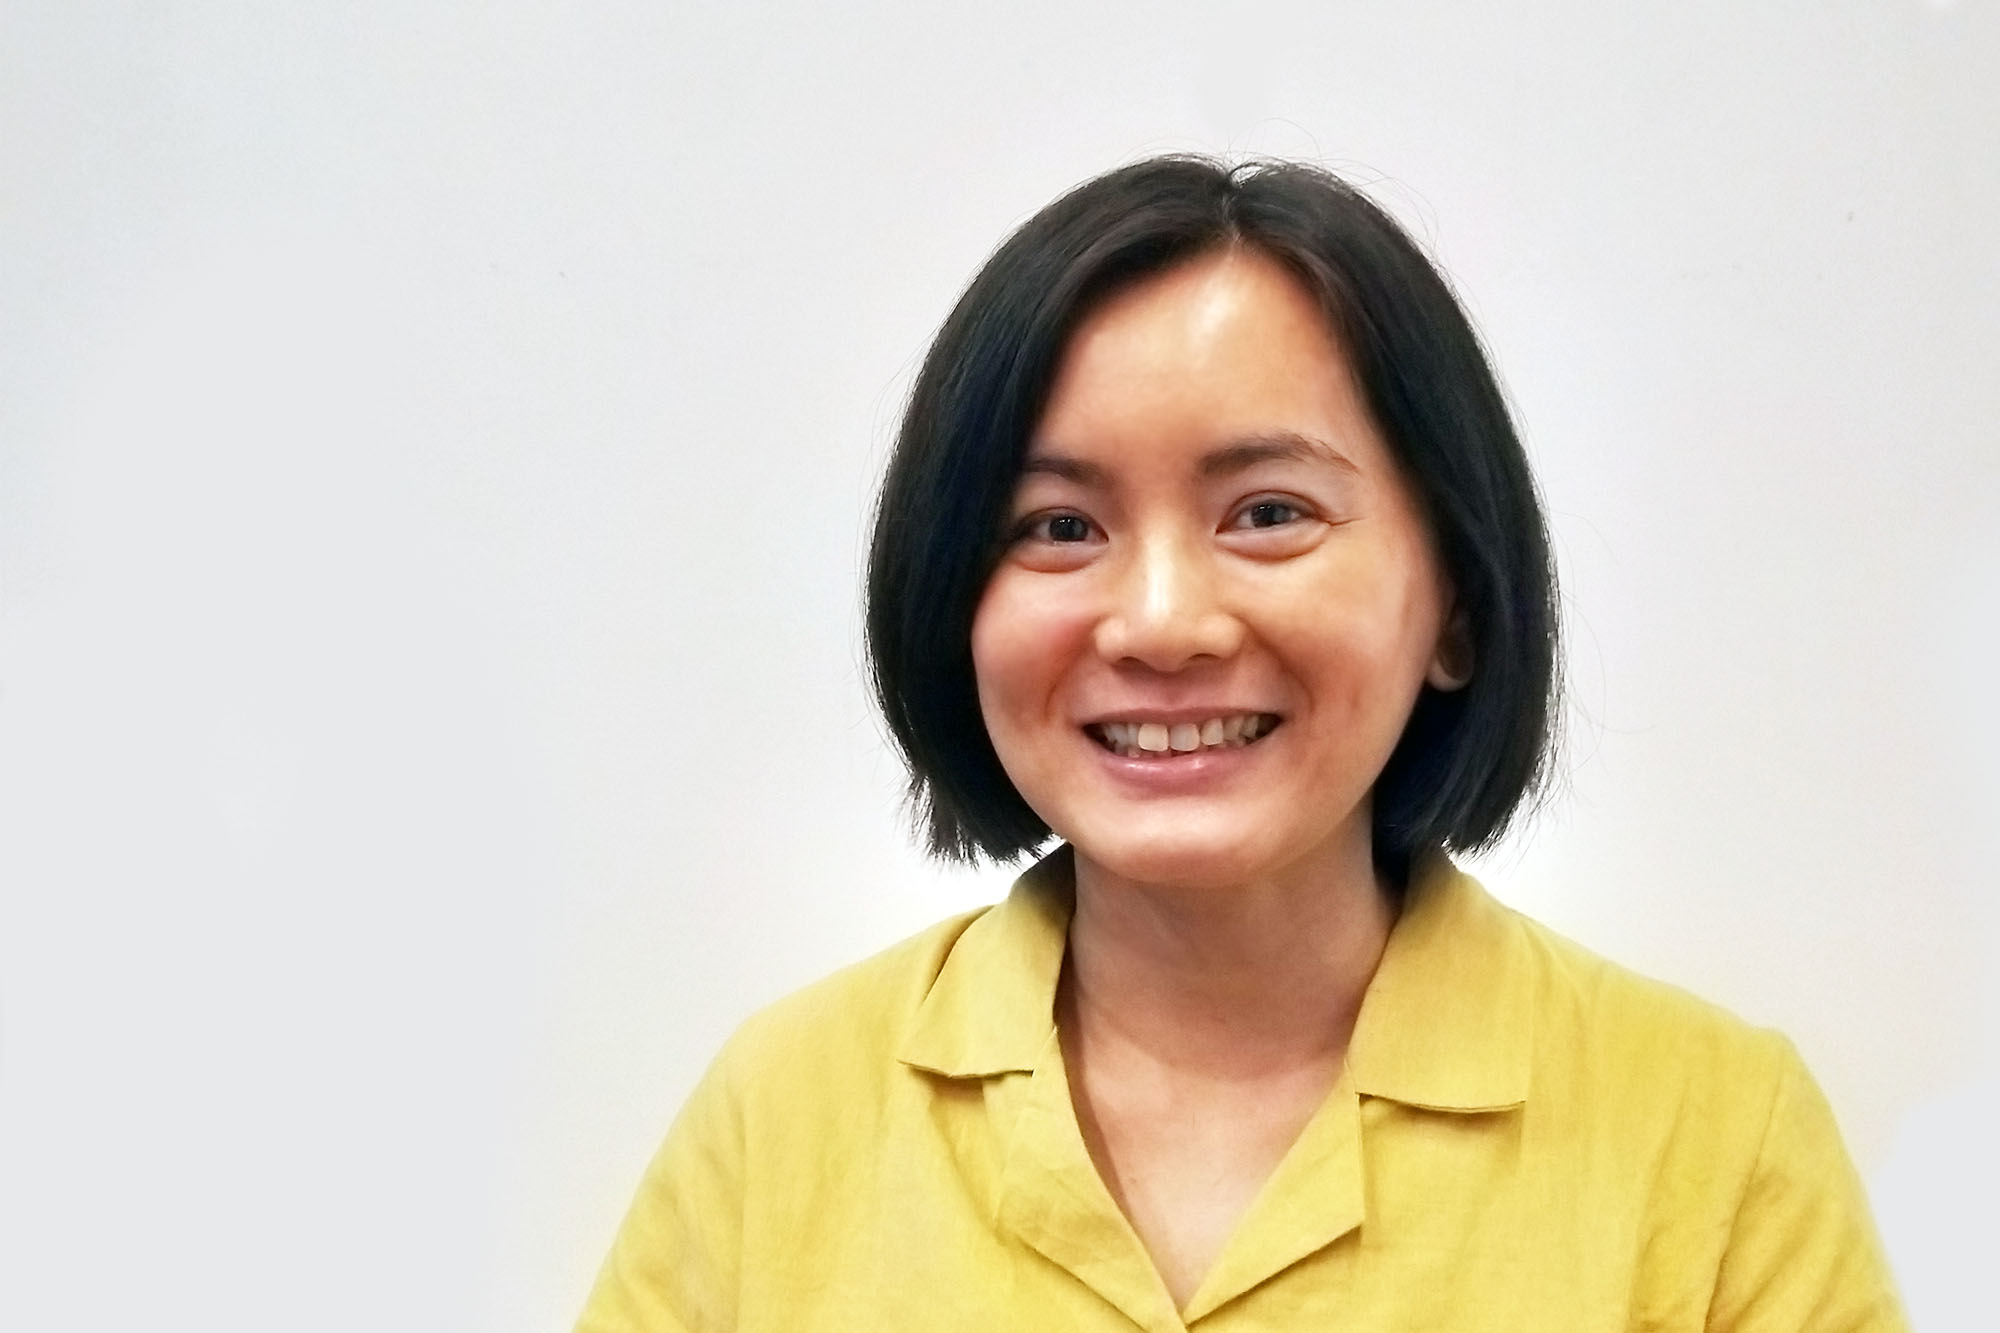 INTERVIEW : FOO SWEE CHIN